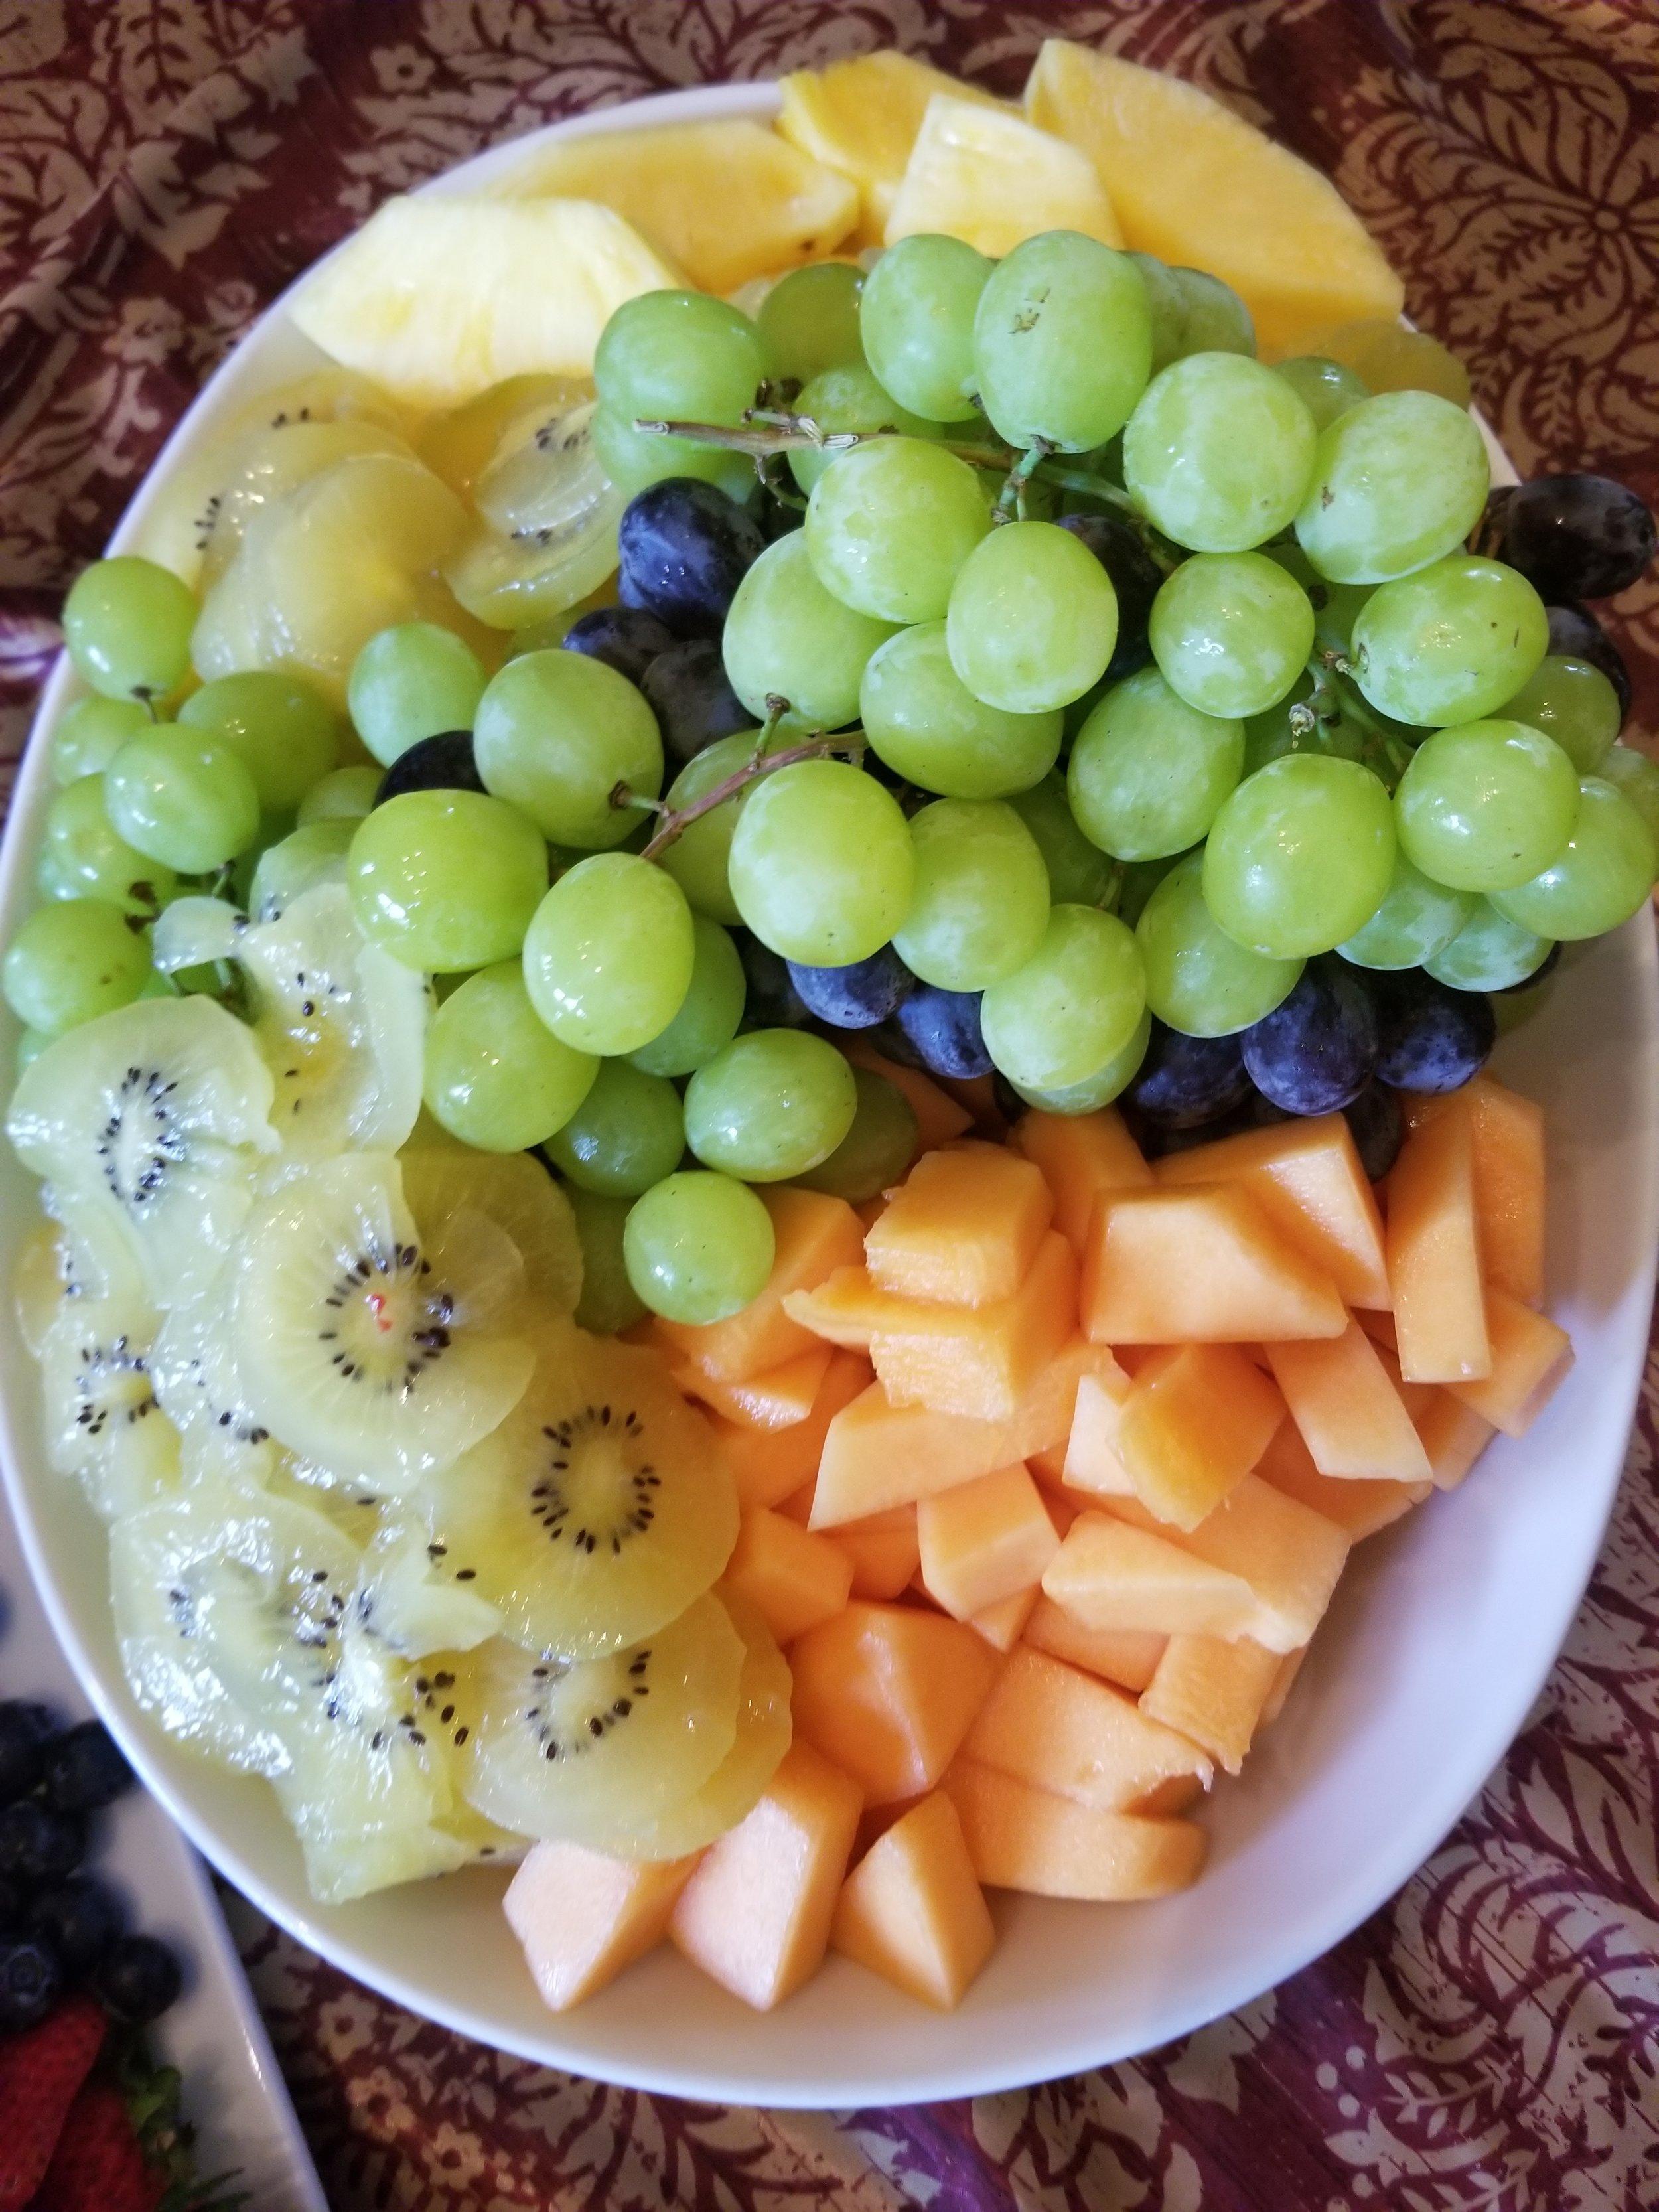 FruitDisplay1.jpg